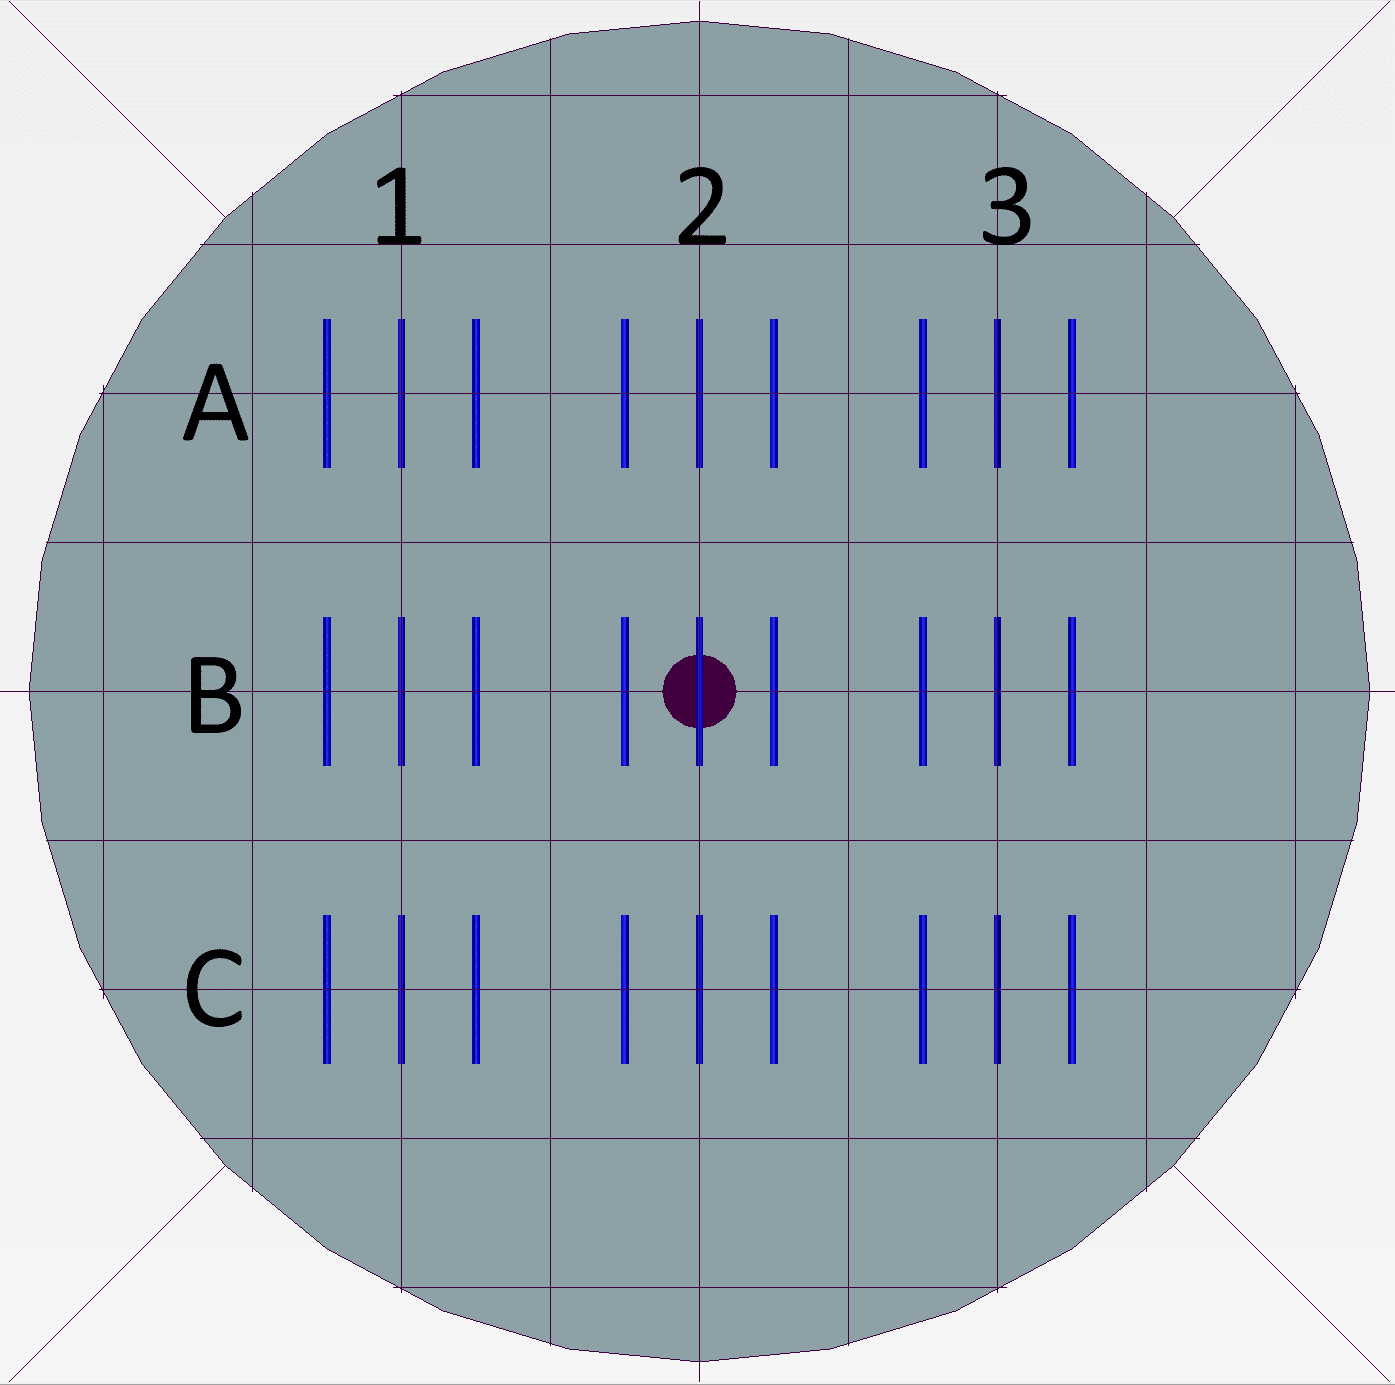 g-code line tests for print parameter optimization